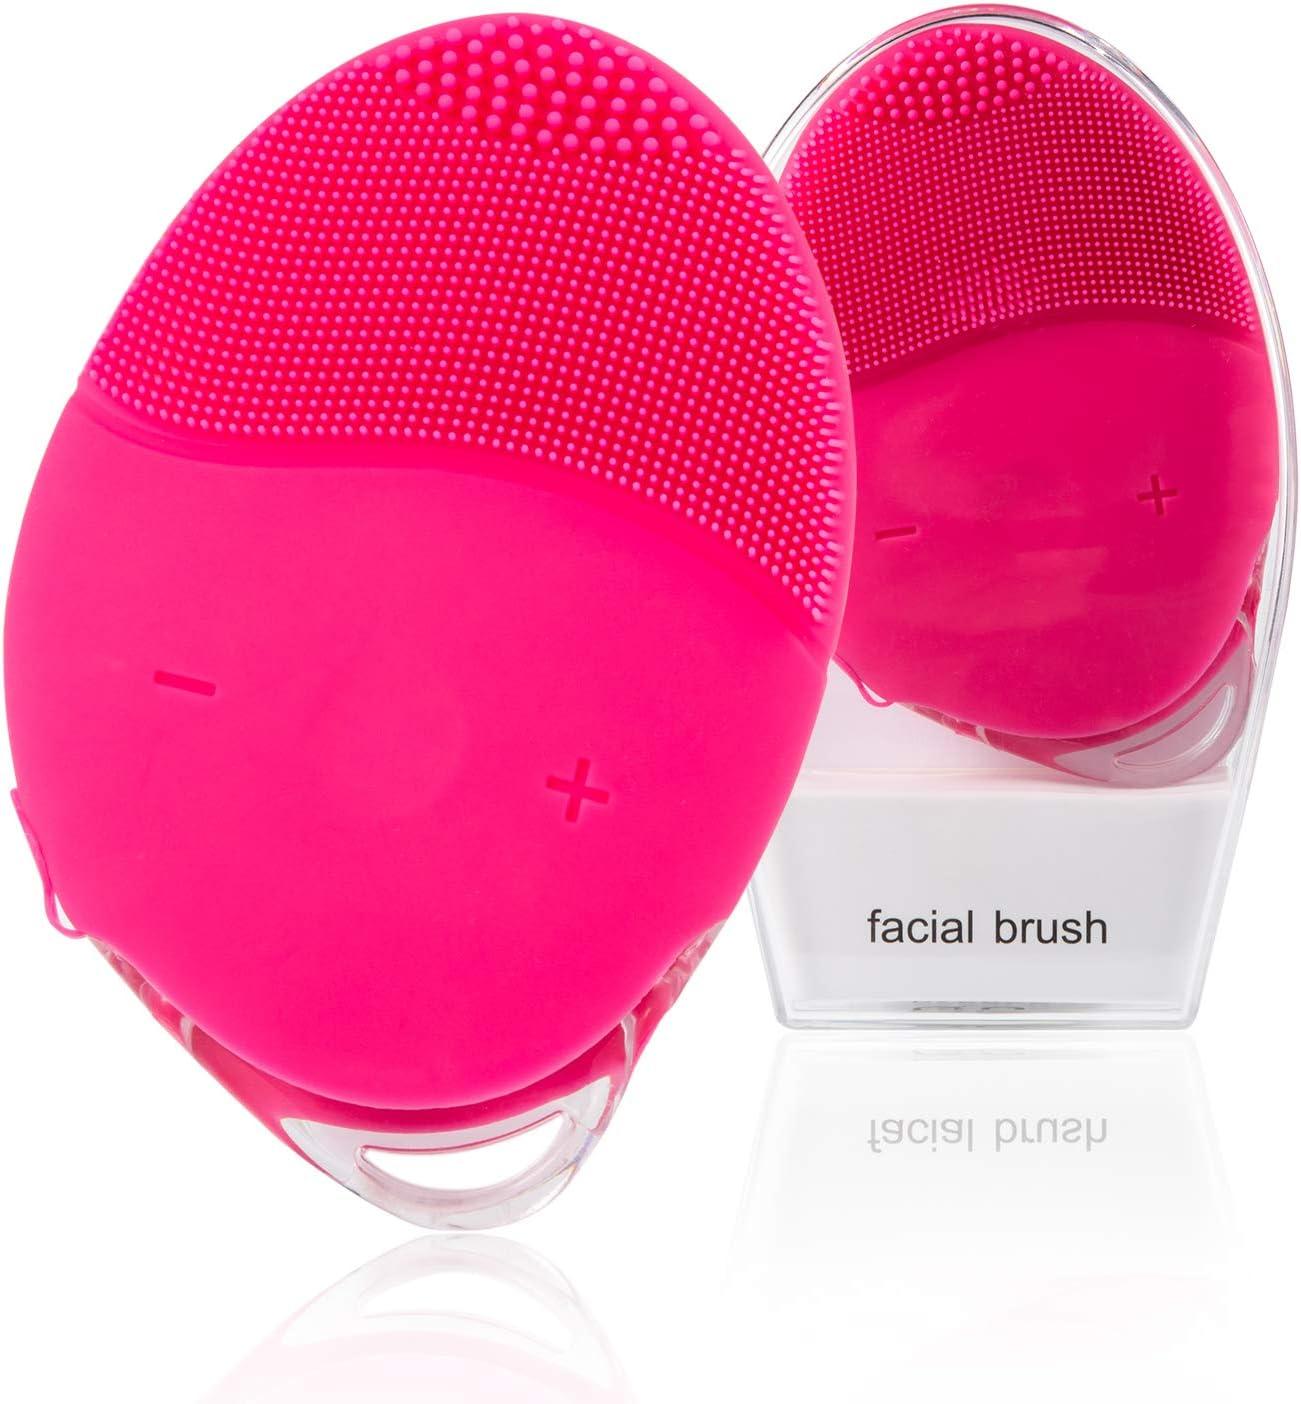 Cepillo de Limpieza Facial, H/E Mini Masajeador Facial de Silicona Cepillo Facial Eléctrico Limpieza profunda Impermeable y recargable,Exfolia delicadamente y elimina las células muertas (Rosa)